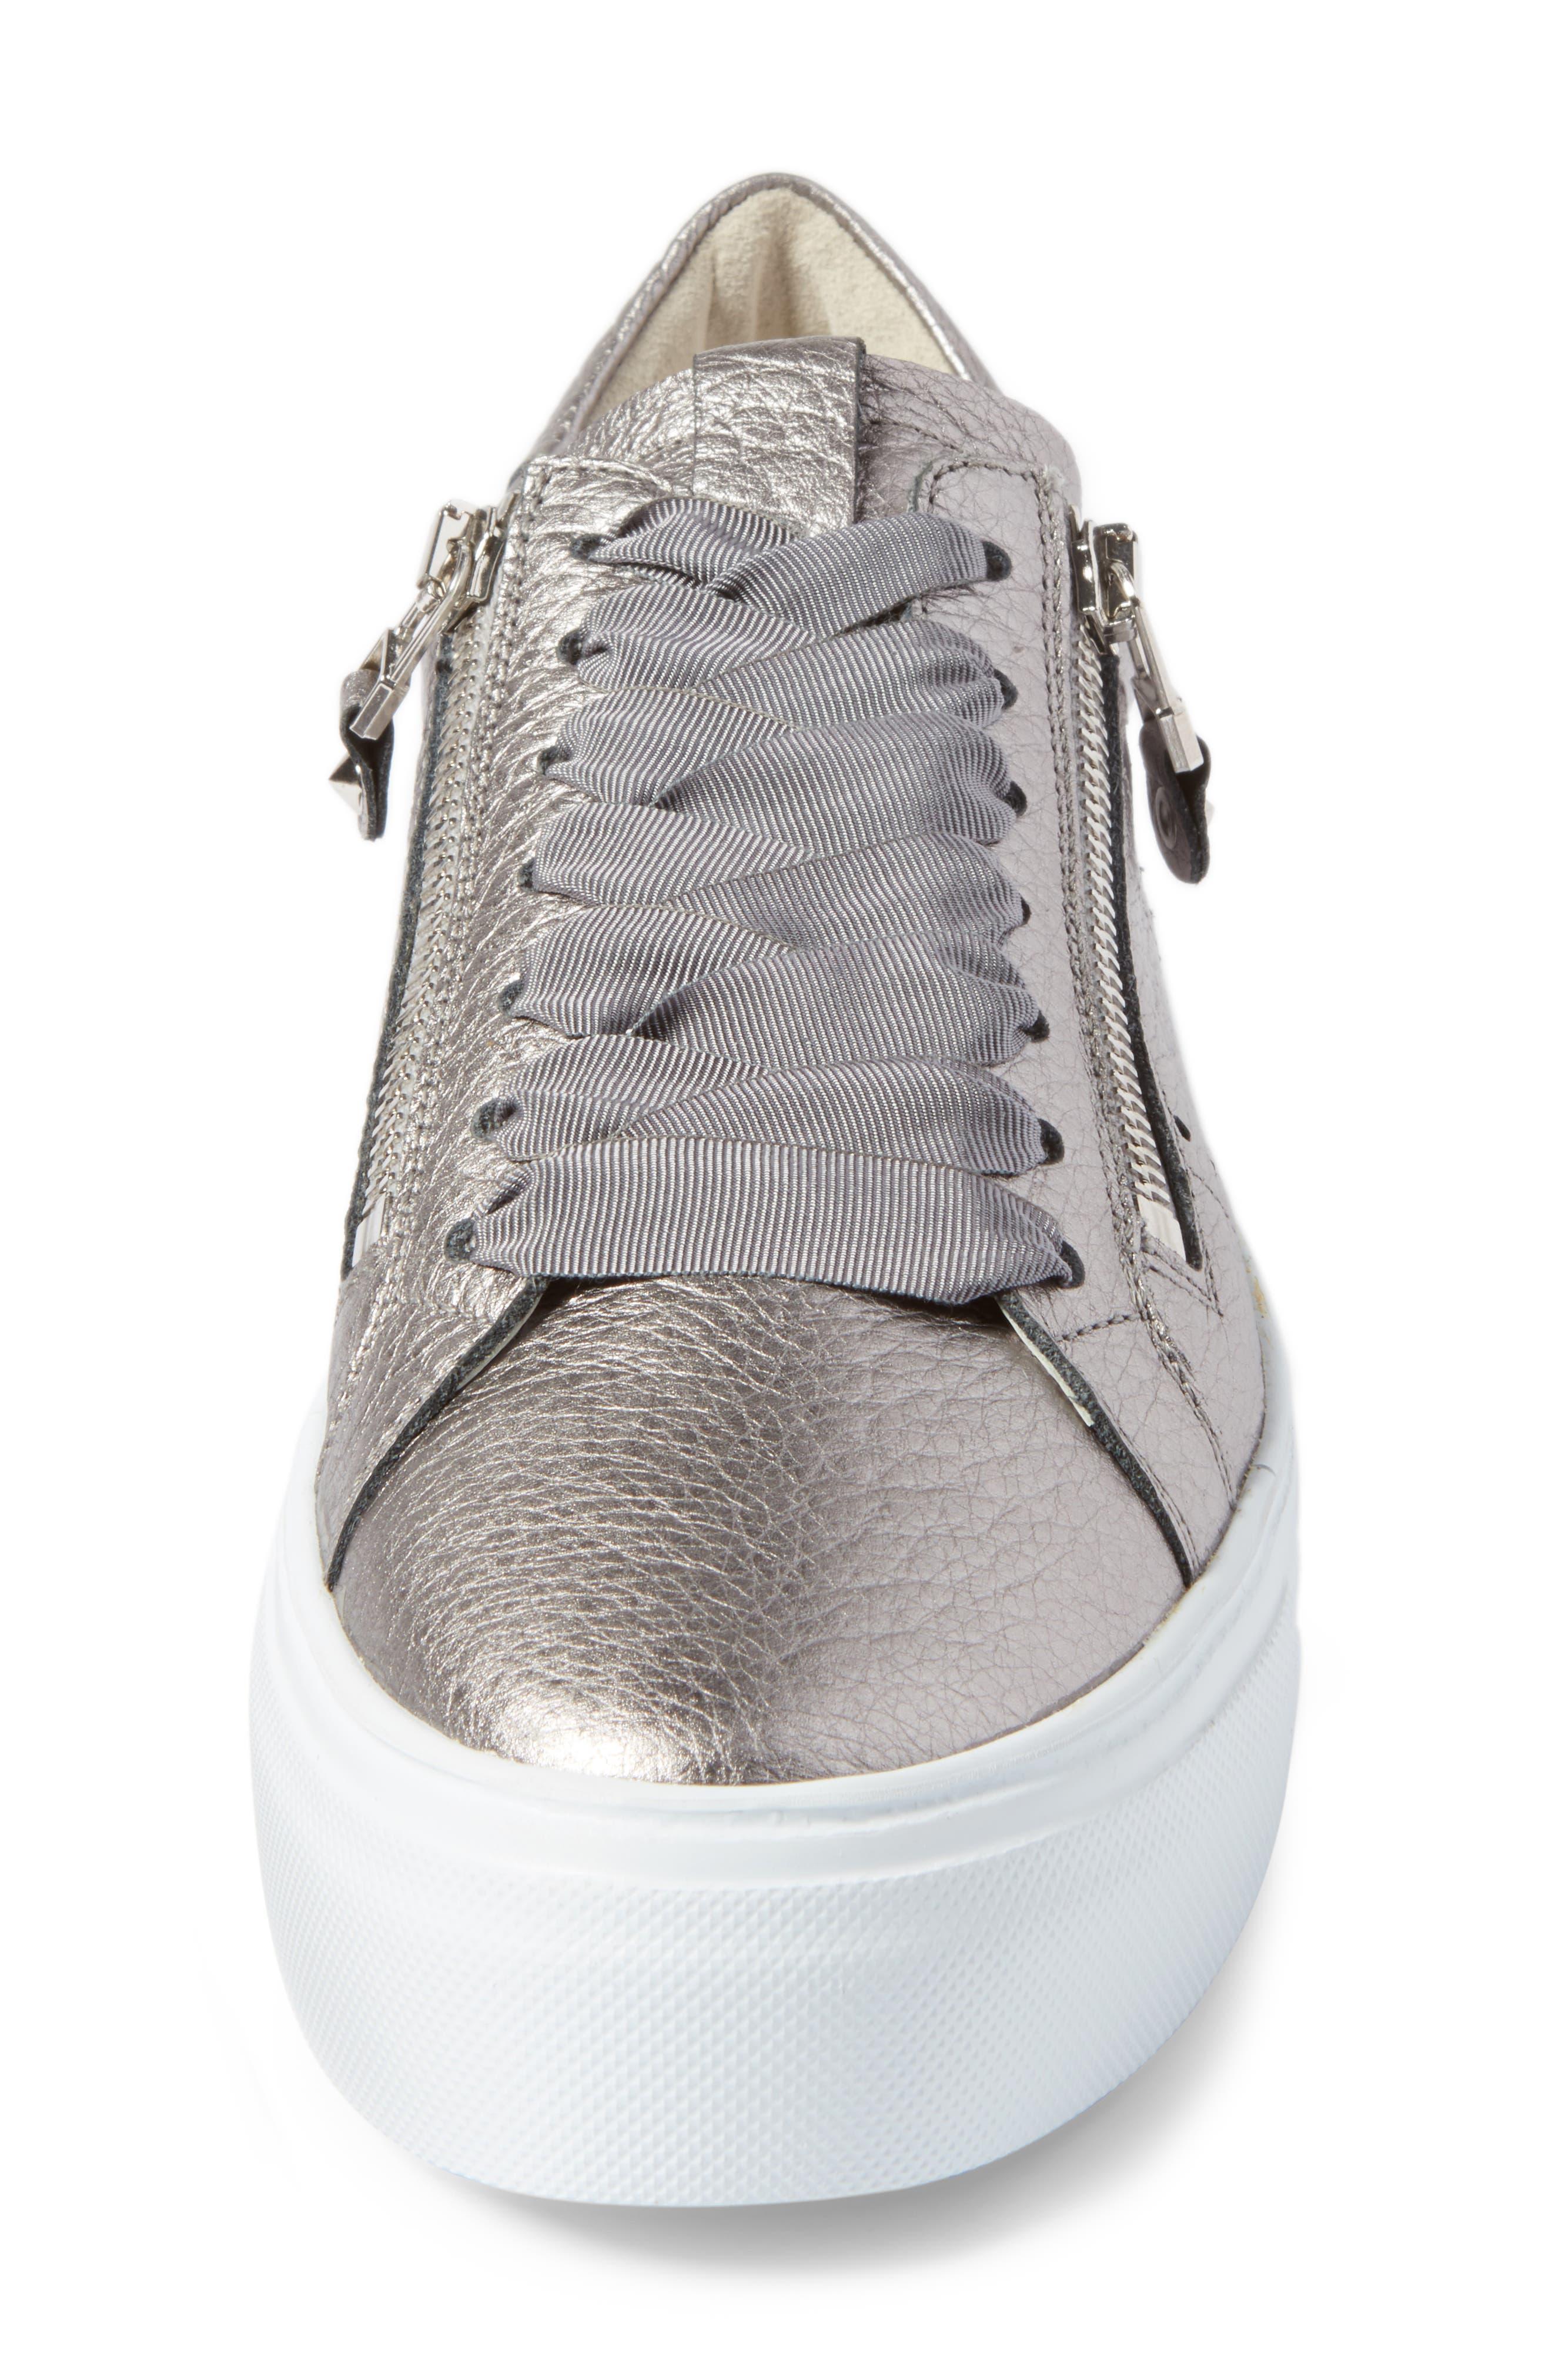 Kennel & Schmenger Big Low Top Platform Sneaker,                             Alternate thumbnail 4, color,                             020